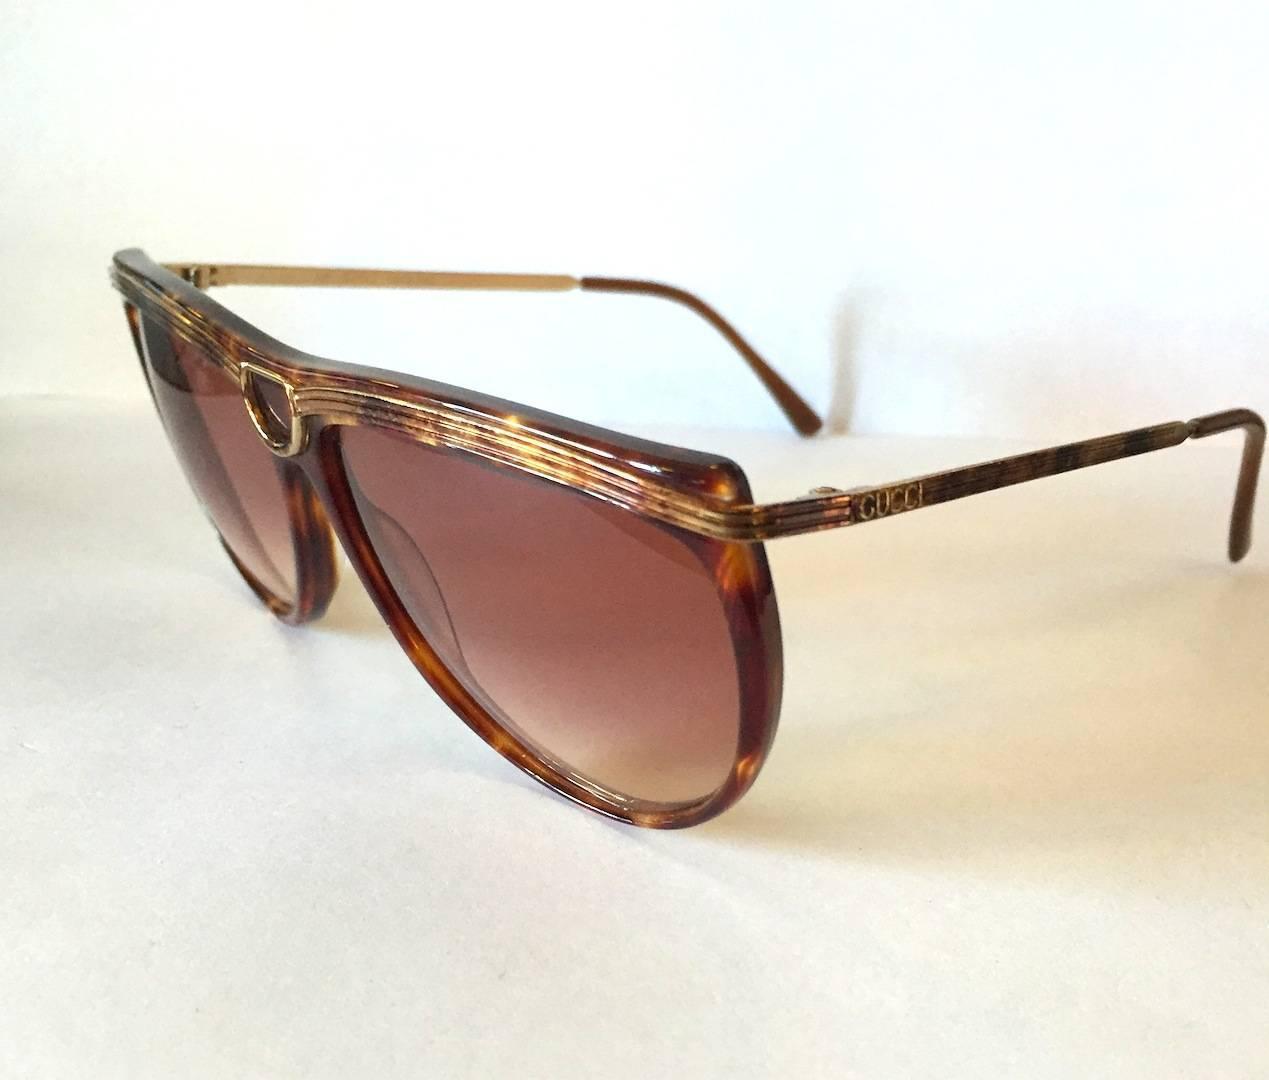 70cb36aeebd3 Vintage Gucci Aviator Sunglasses